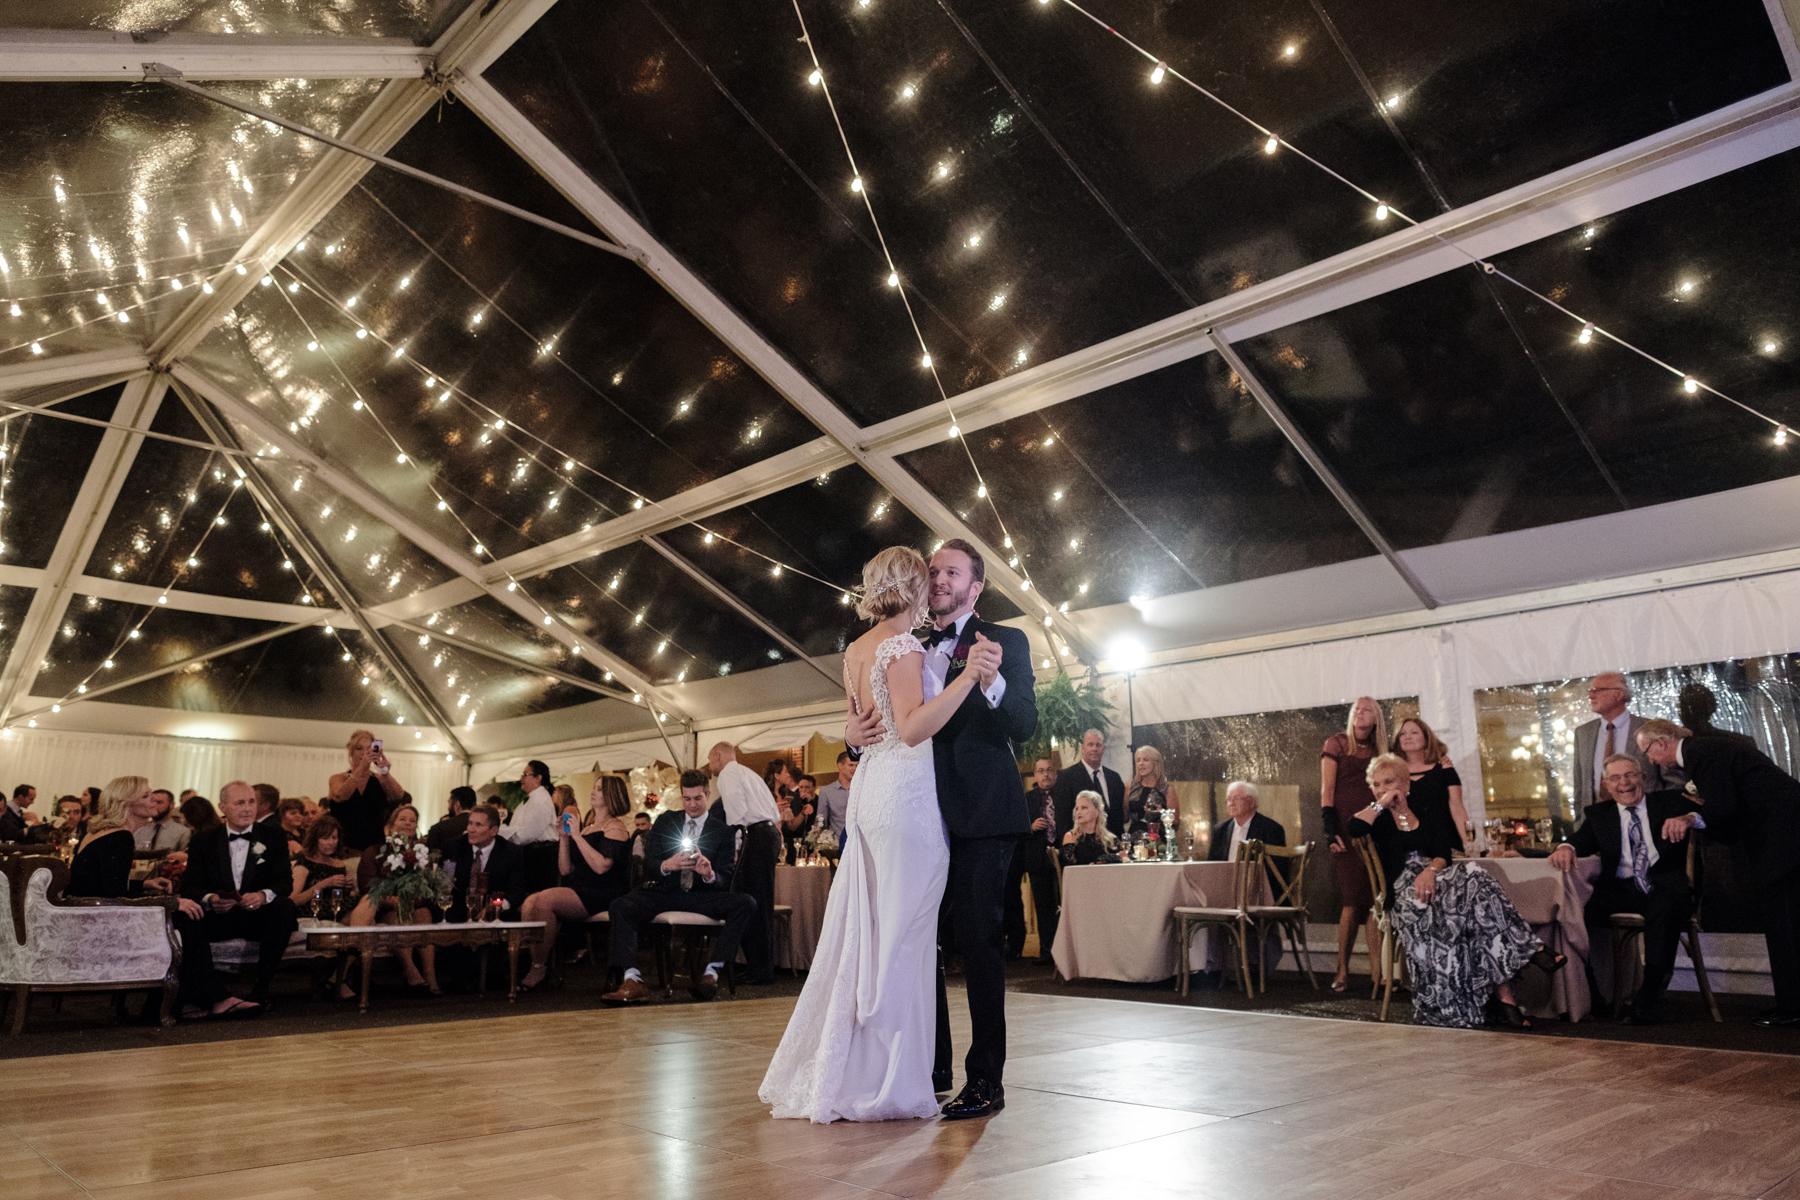 2017_BAP_KalliMatt_Gleneagles_CountryClub_Lemont_Wedding-74.jpg